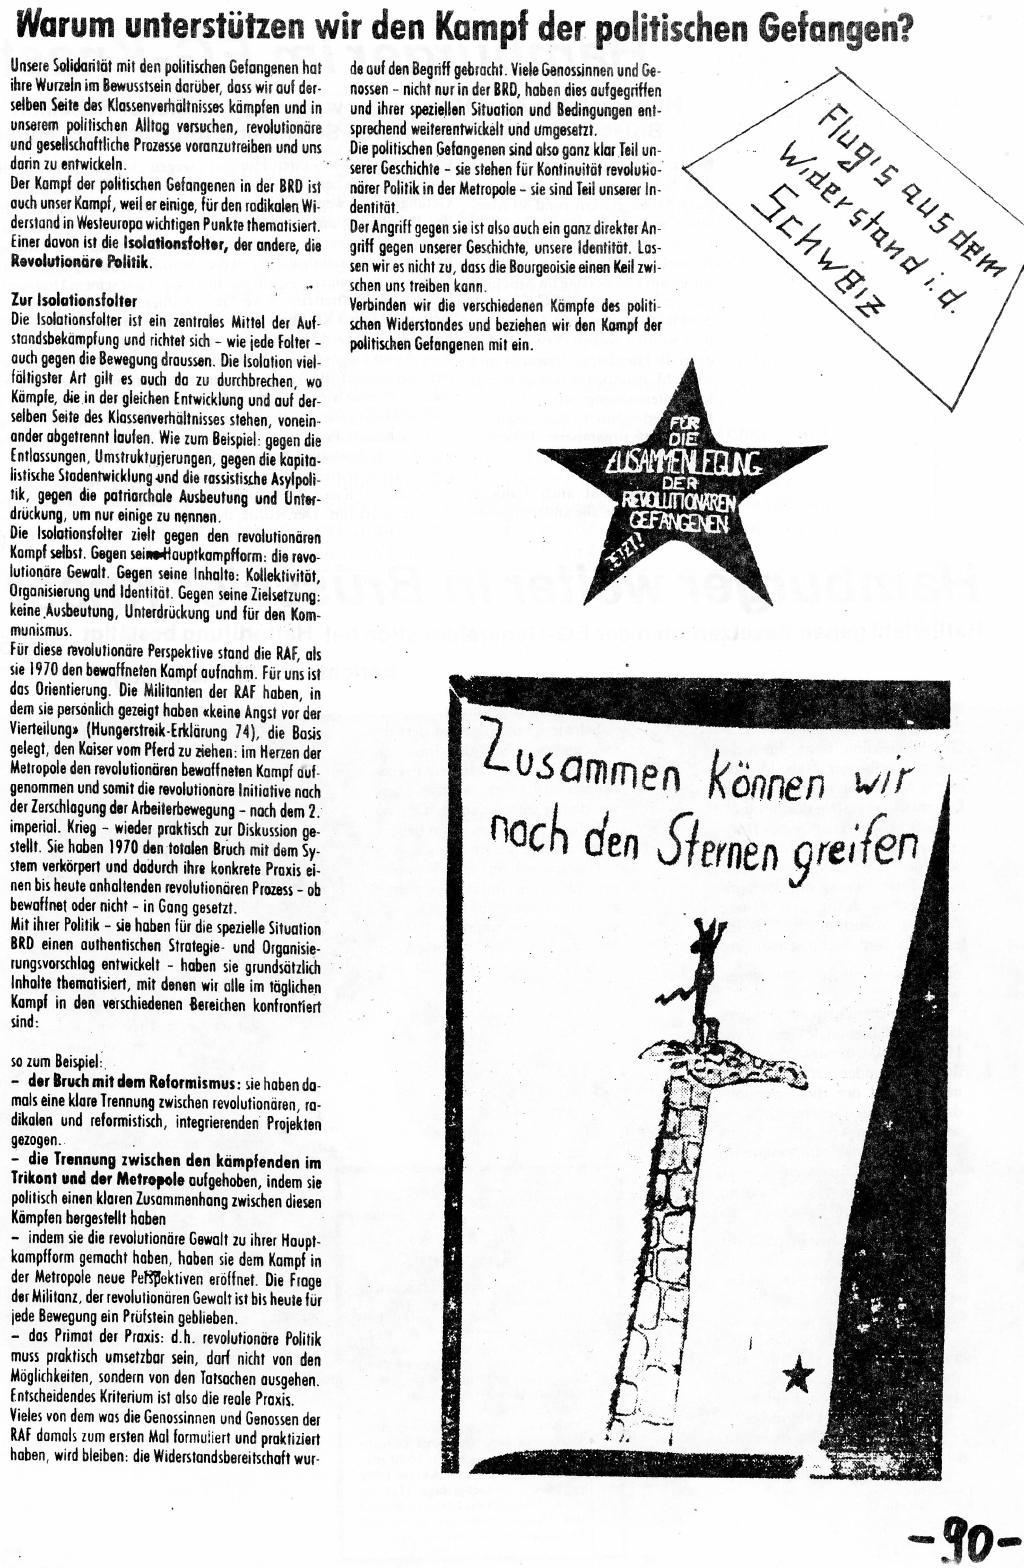 Belgien_Doku_Besetzung_EG_Kommission_1989_092